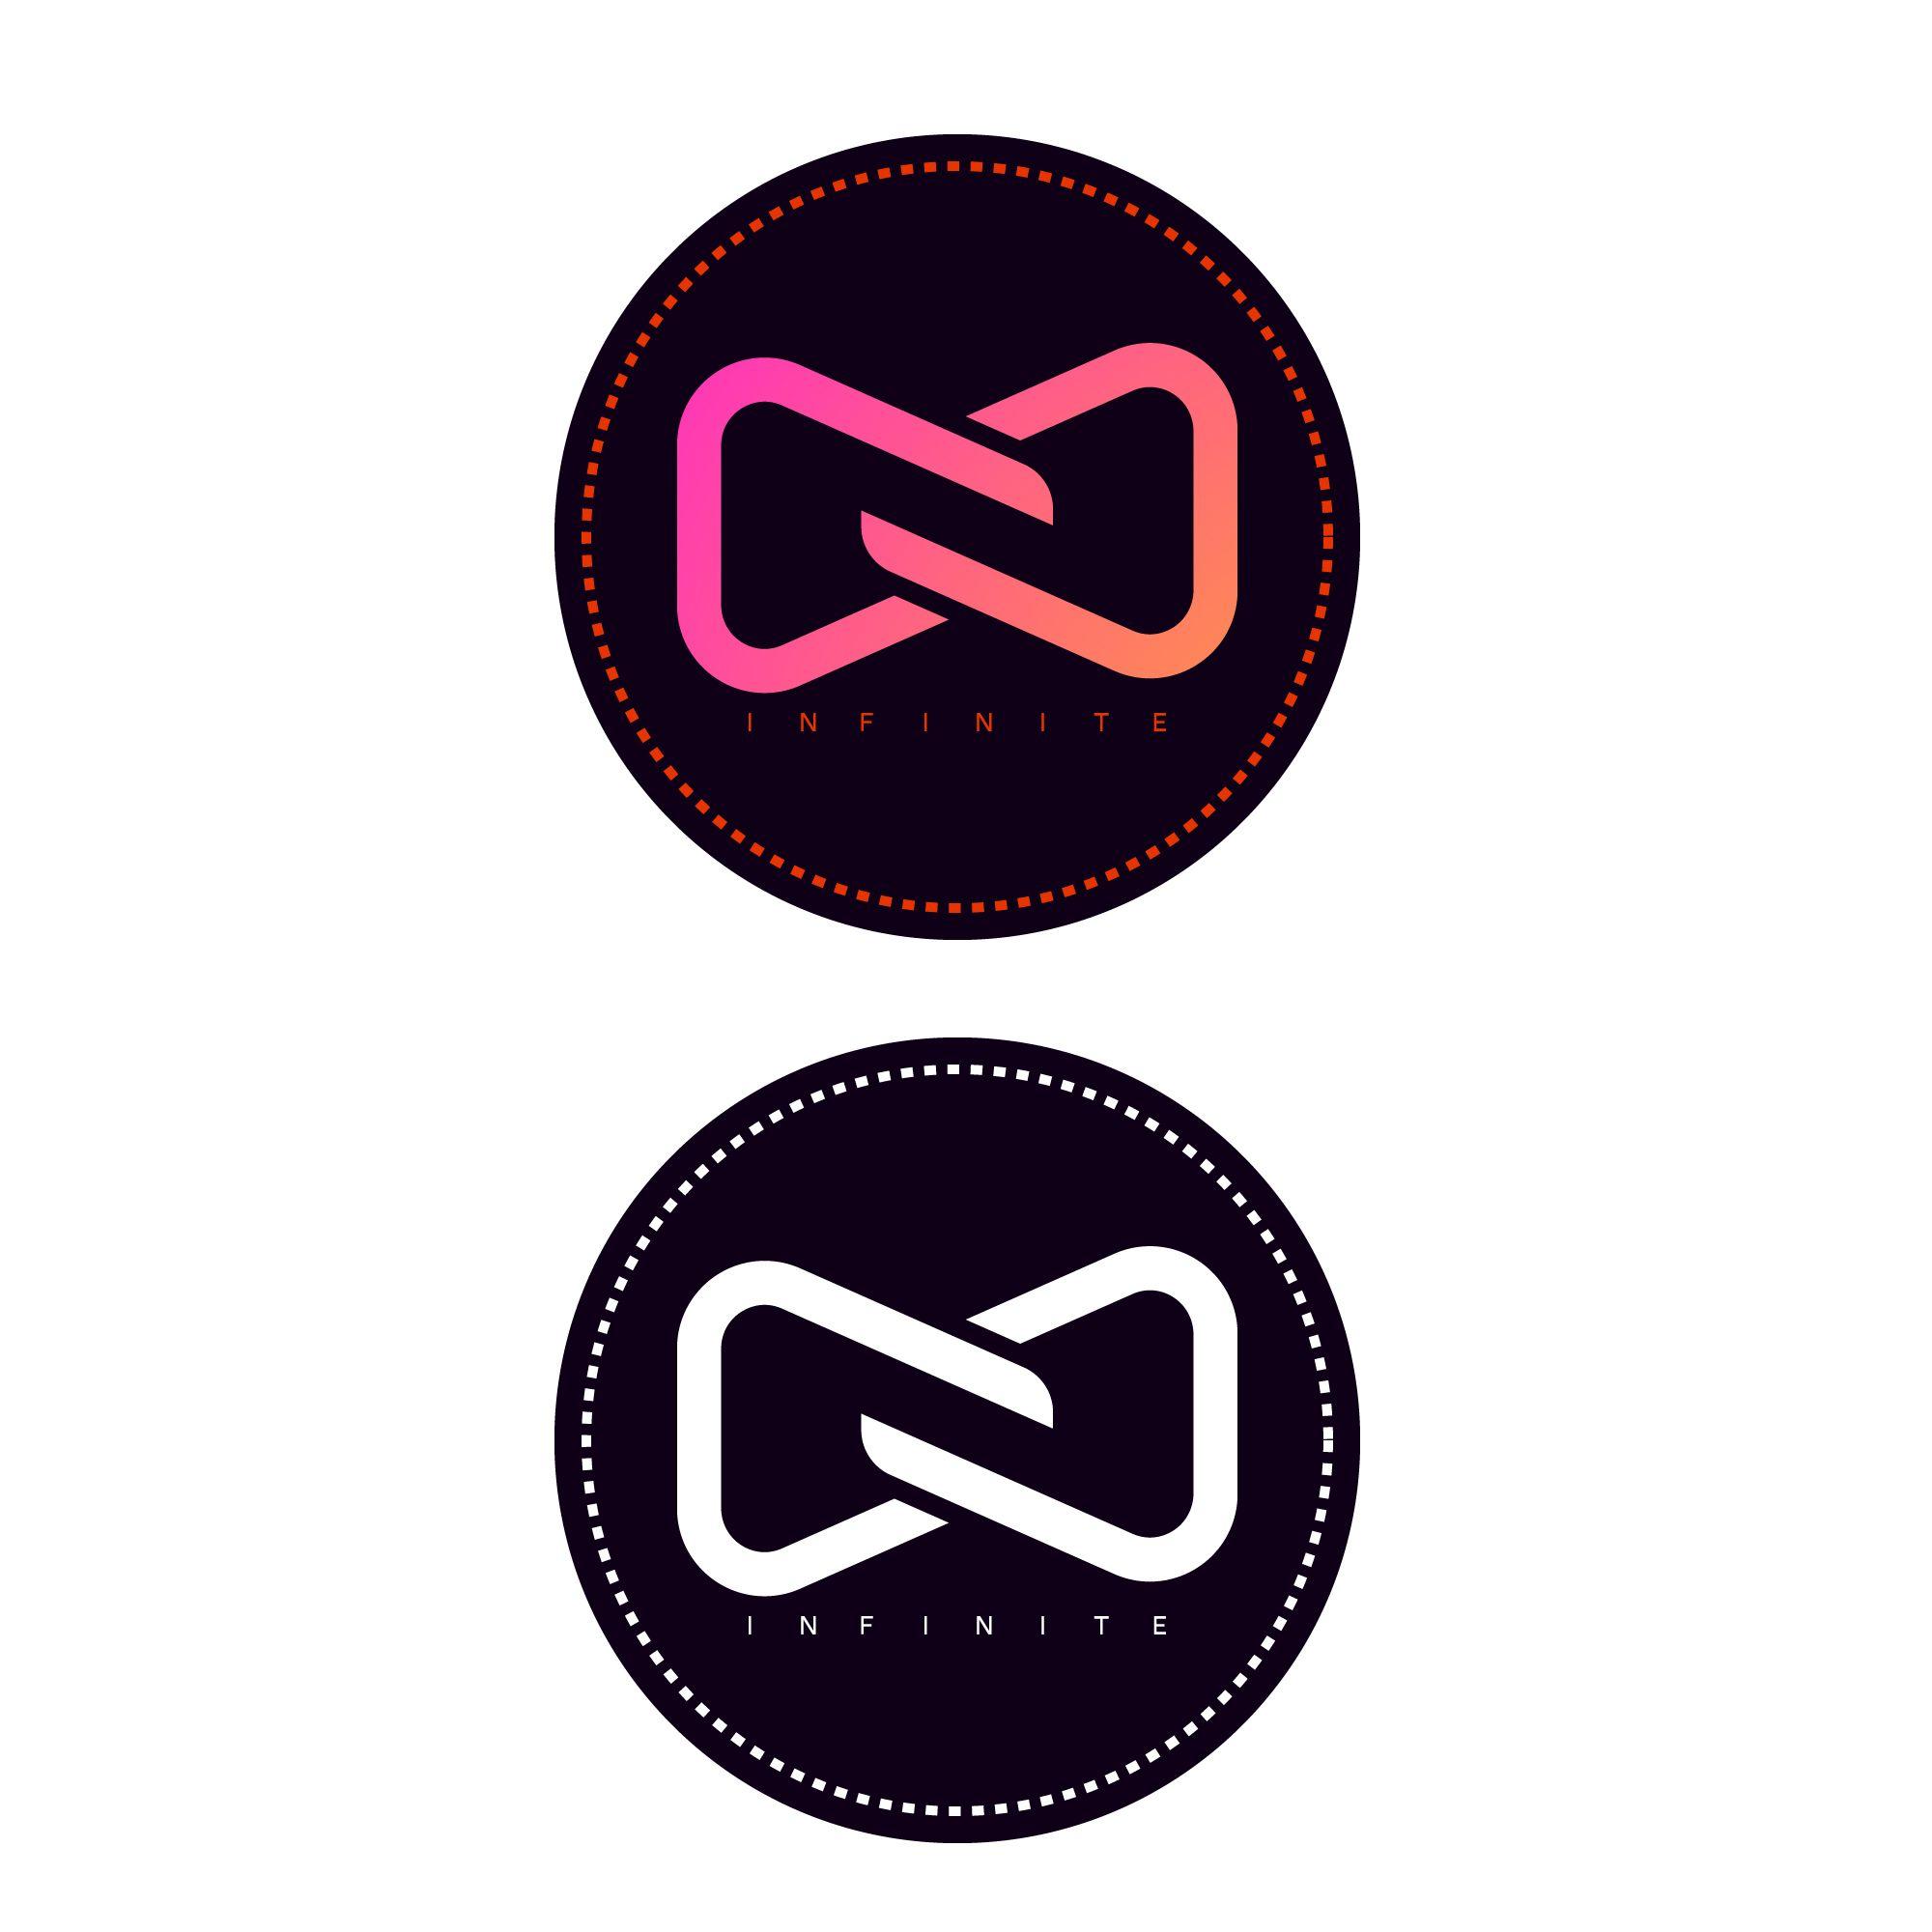 Youtube Channel Logo 97098 Personal Design In 2020 Channel Logo Logo Design Inspiration Logos